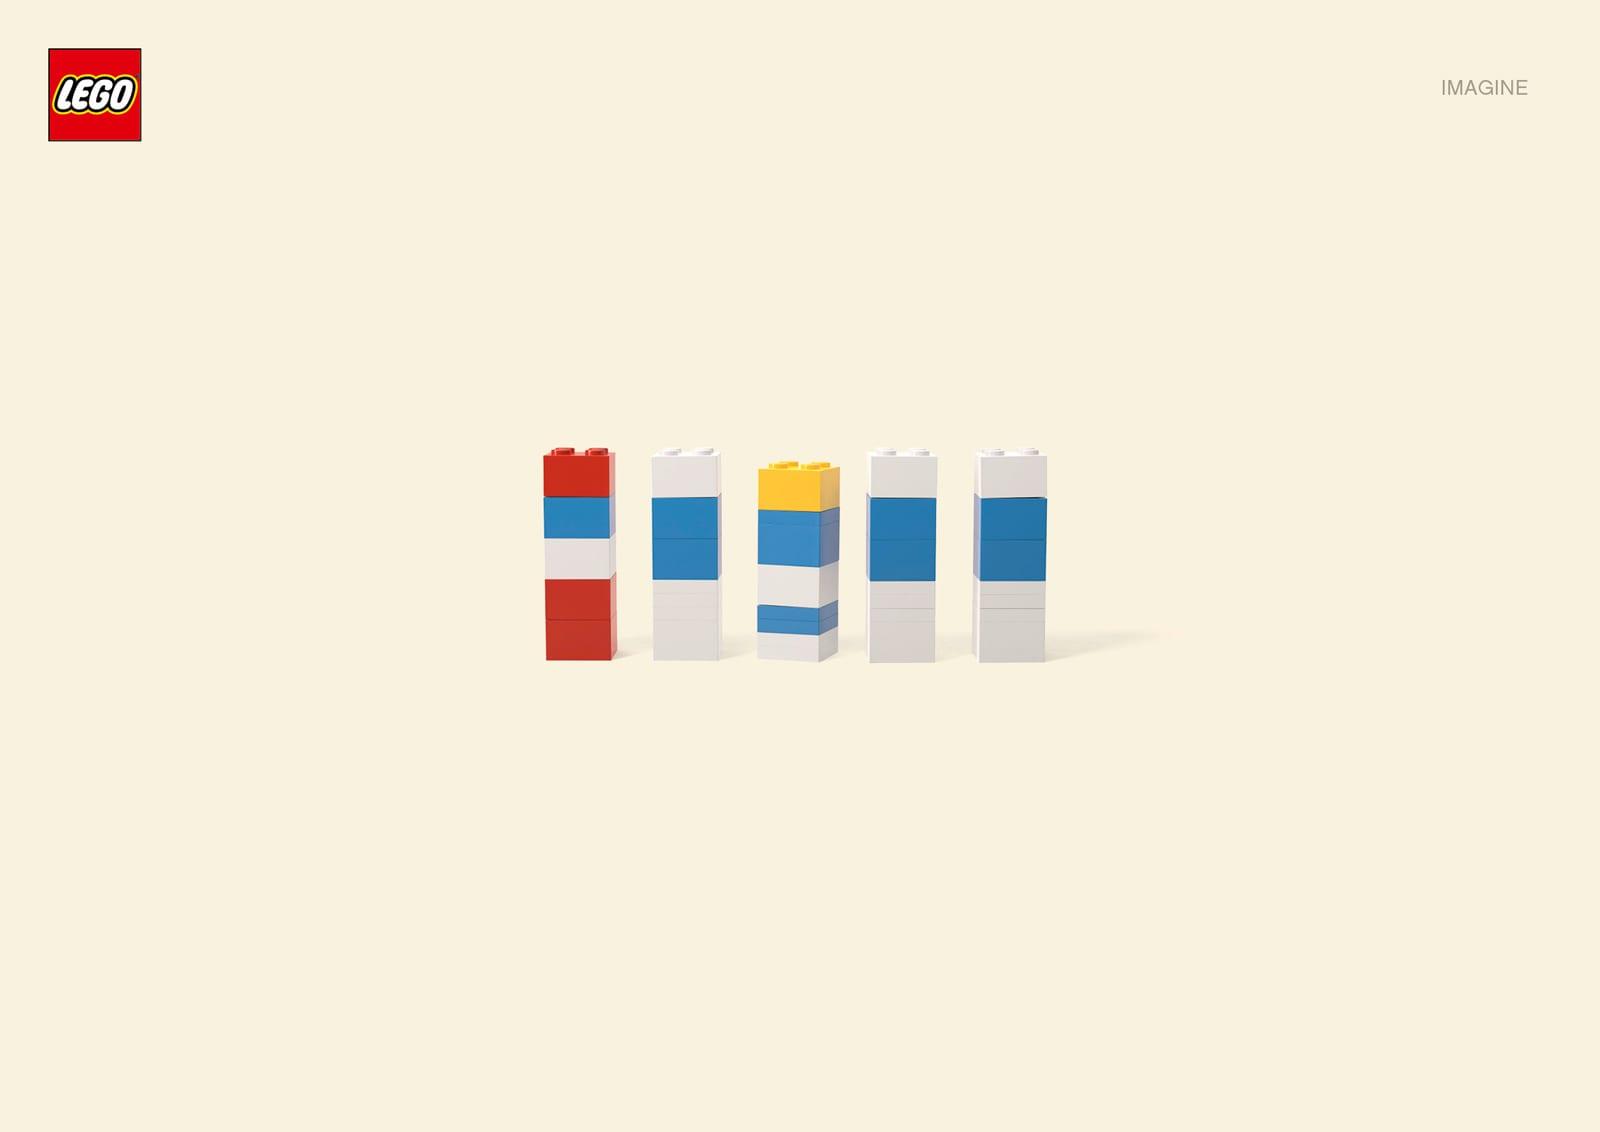 lego minimalista (1)